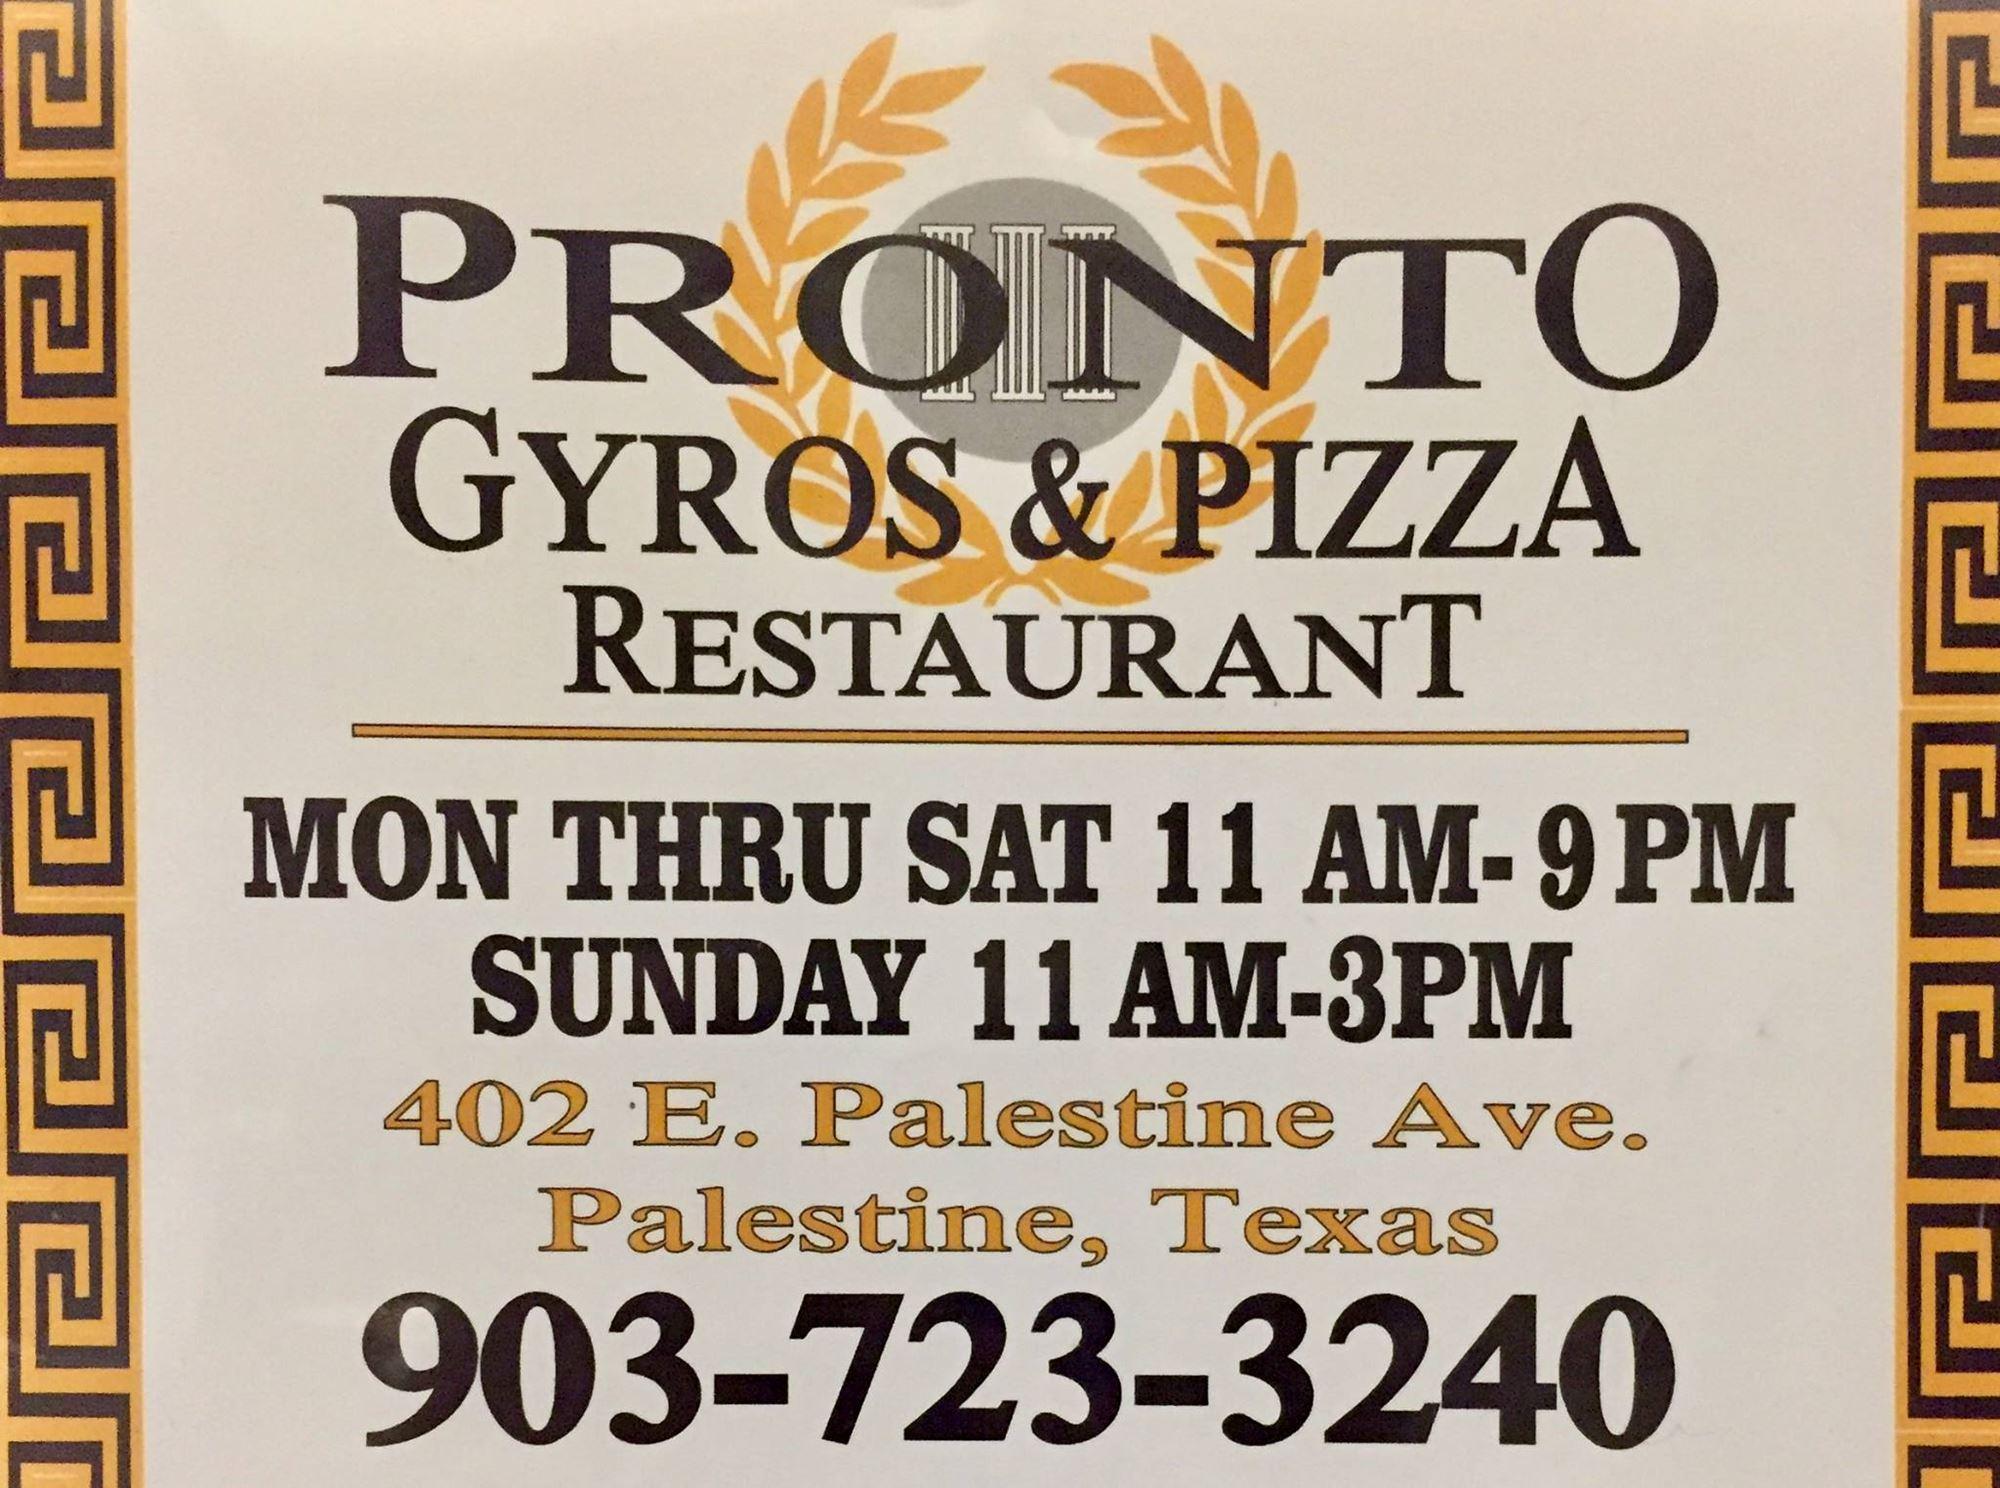 Pronto Gyros & Pizza